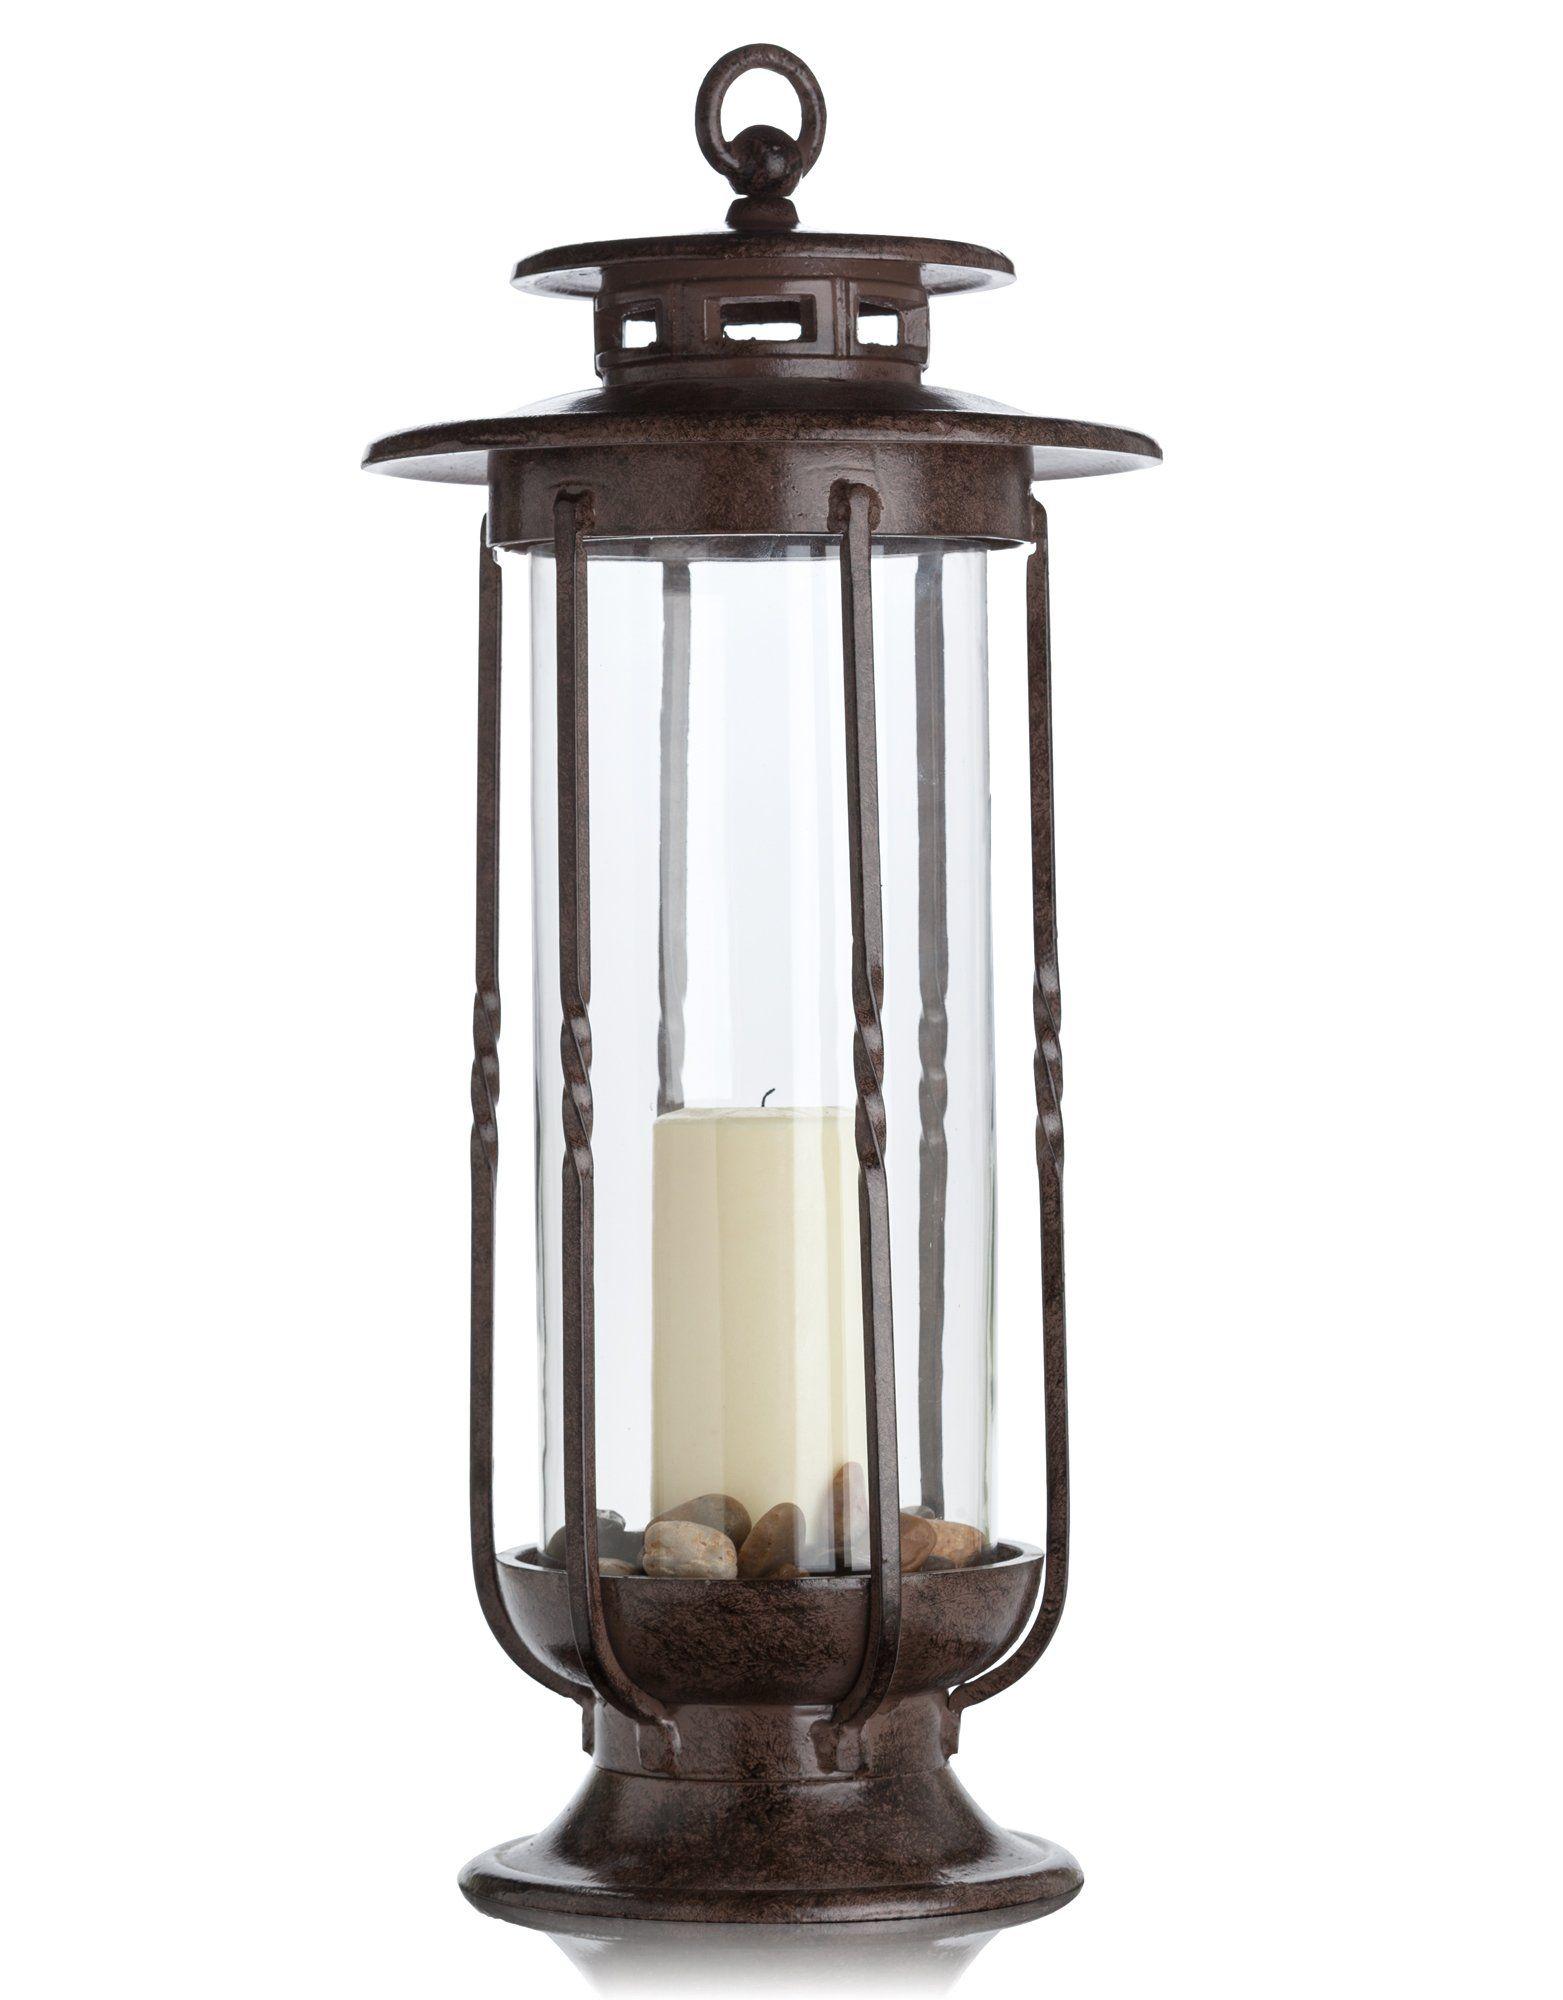 H Potter Decorative Hanging Patio Deck Candle Holder Lantern Indoor Outdoor